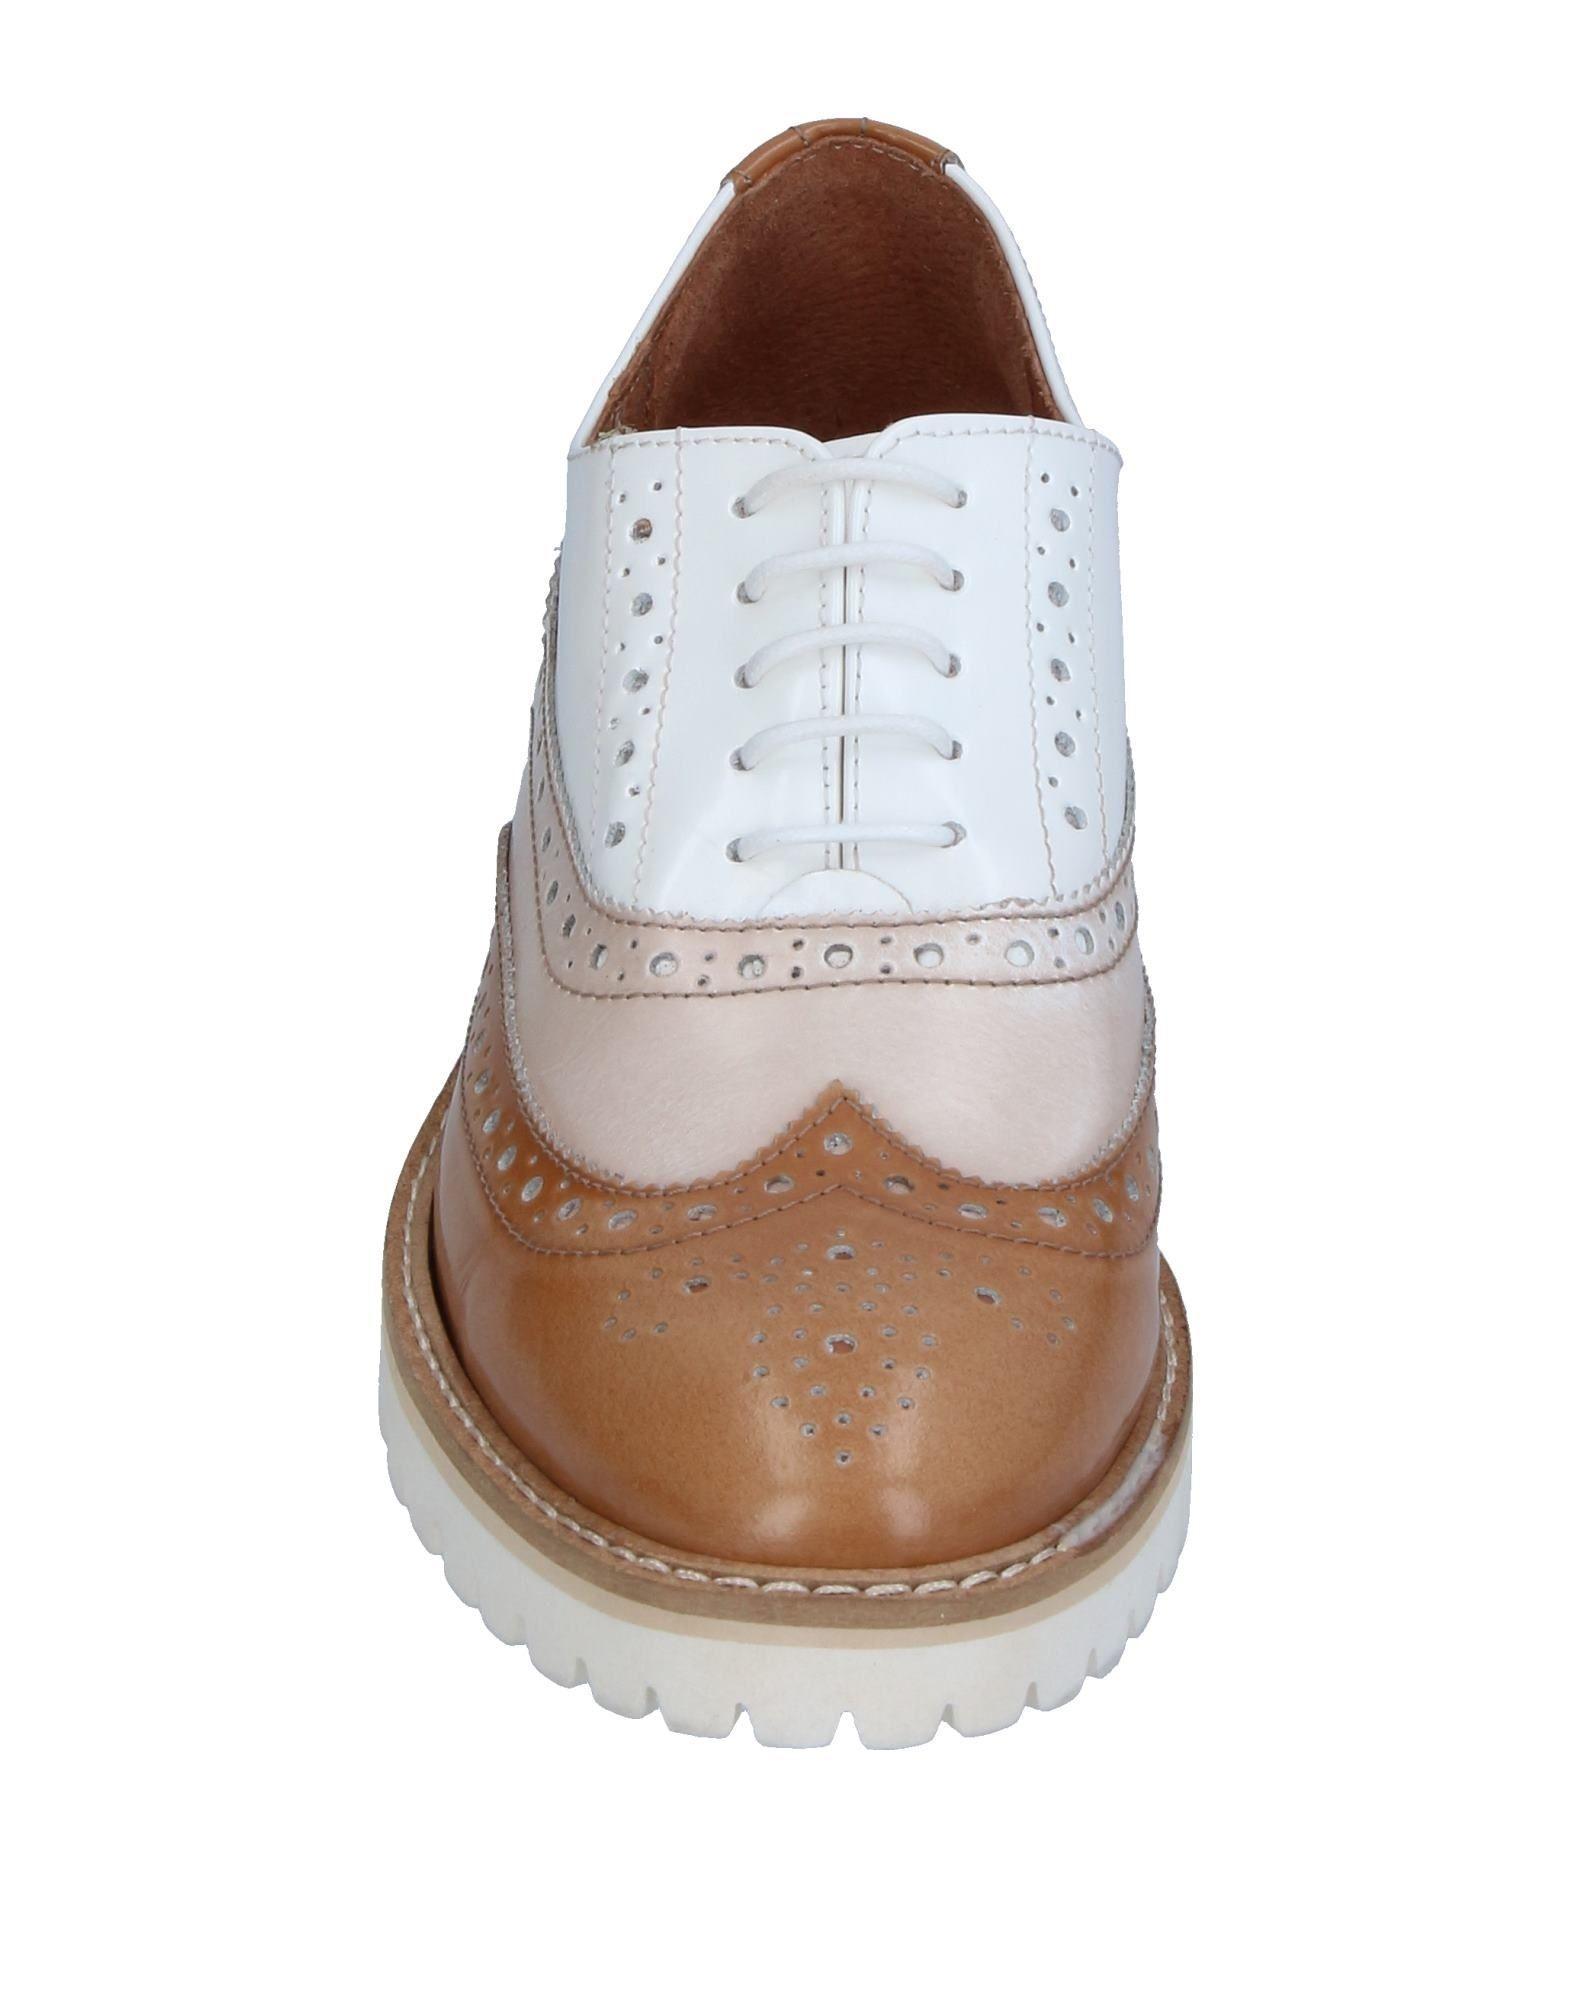 Chaussures À Lacets Ovye By Cristina Lucchi Femme - Chaussures À Lacets Ovye By Cristina Lucchi sur